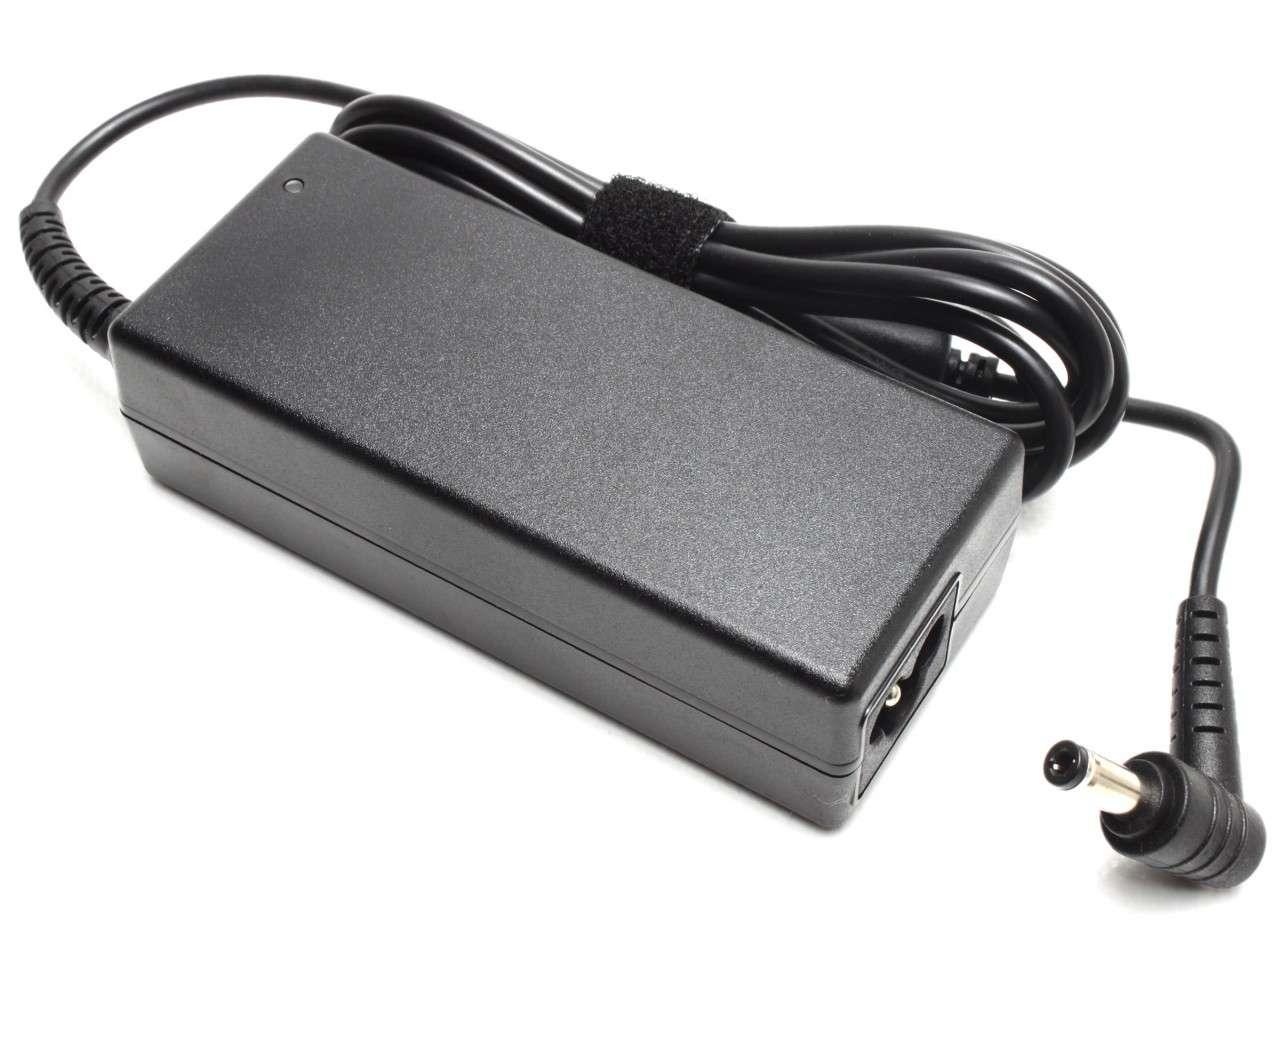 Incarcator Philips Freevents 12NB5808 imagine powerlaptop.ro 2021